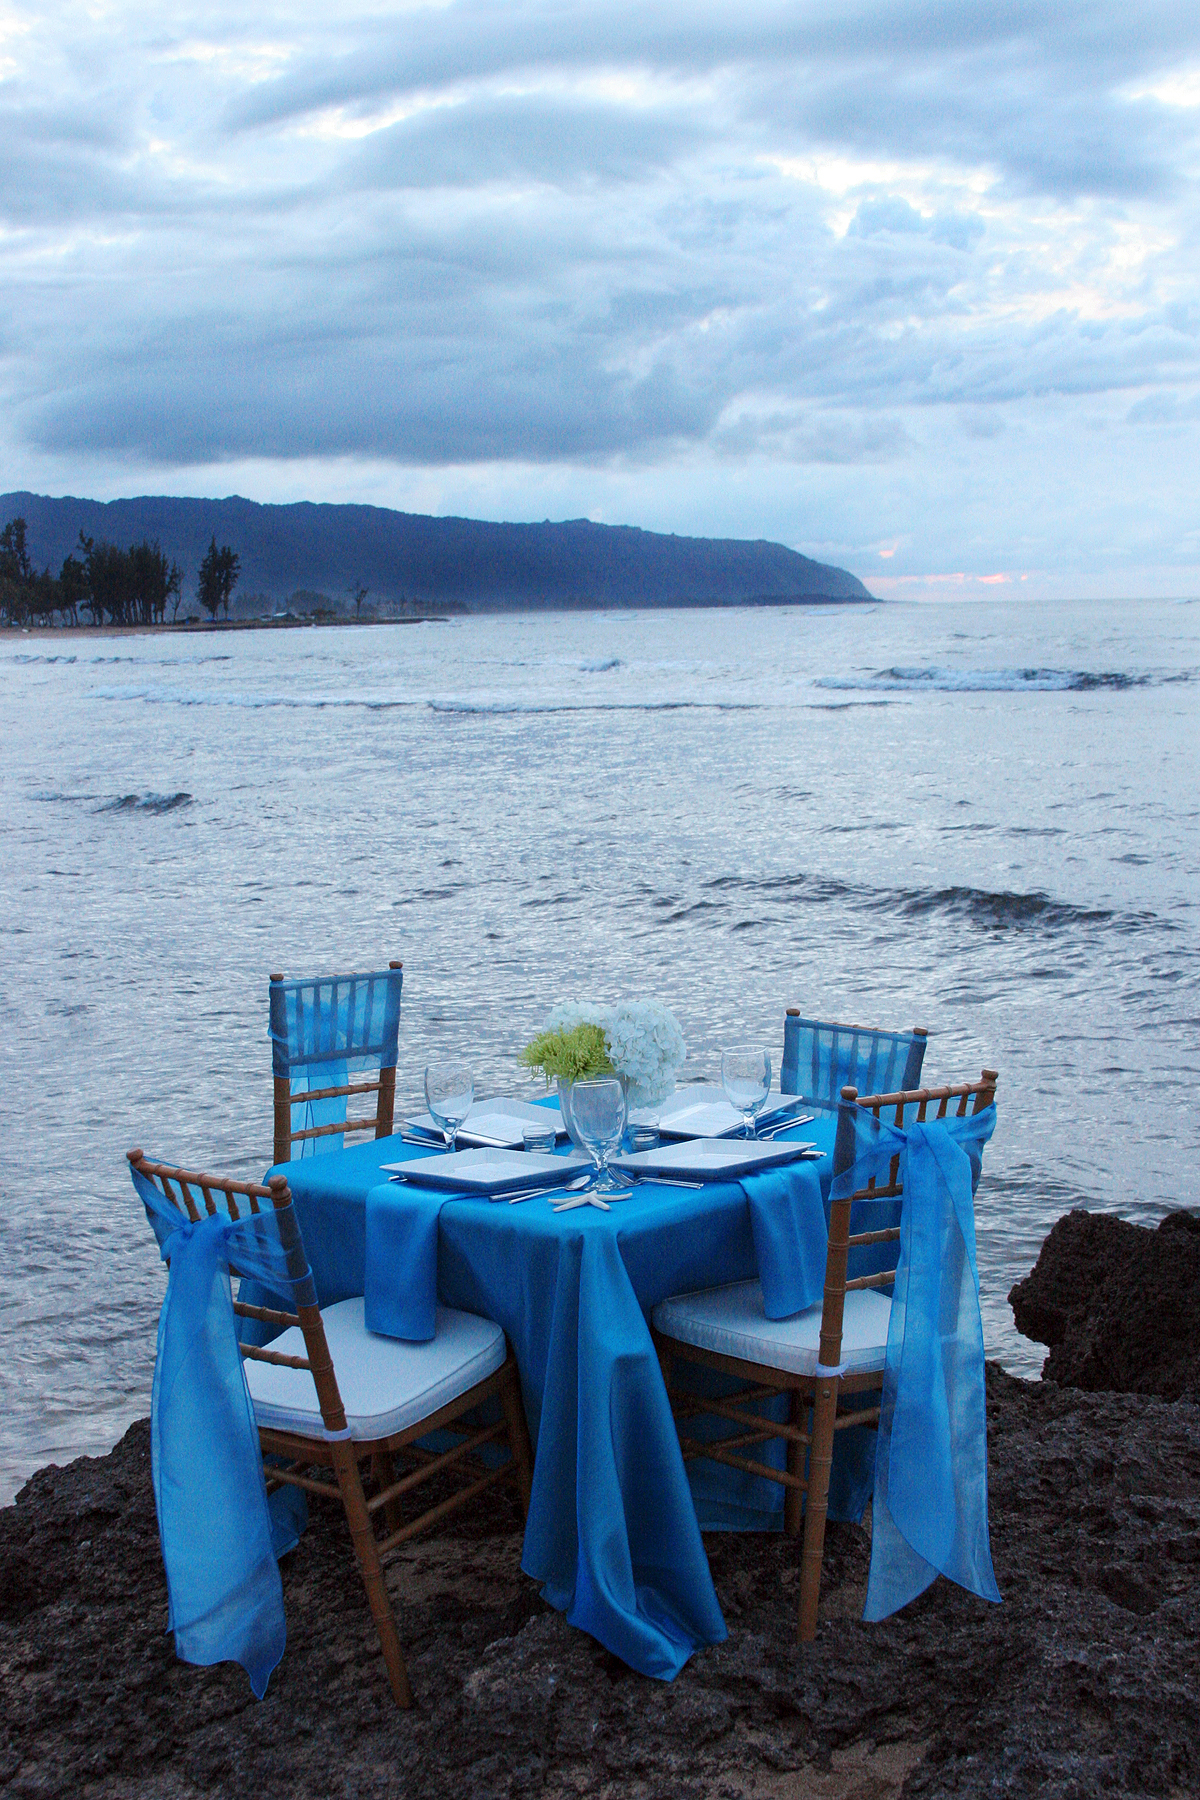 Reception, Flowers & Decor, Decor, Destinations, Hawaii, Centerpieces, Centerpiece, Tropical, Ocean, Dinner, Seasons of life wedding and event planning llc